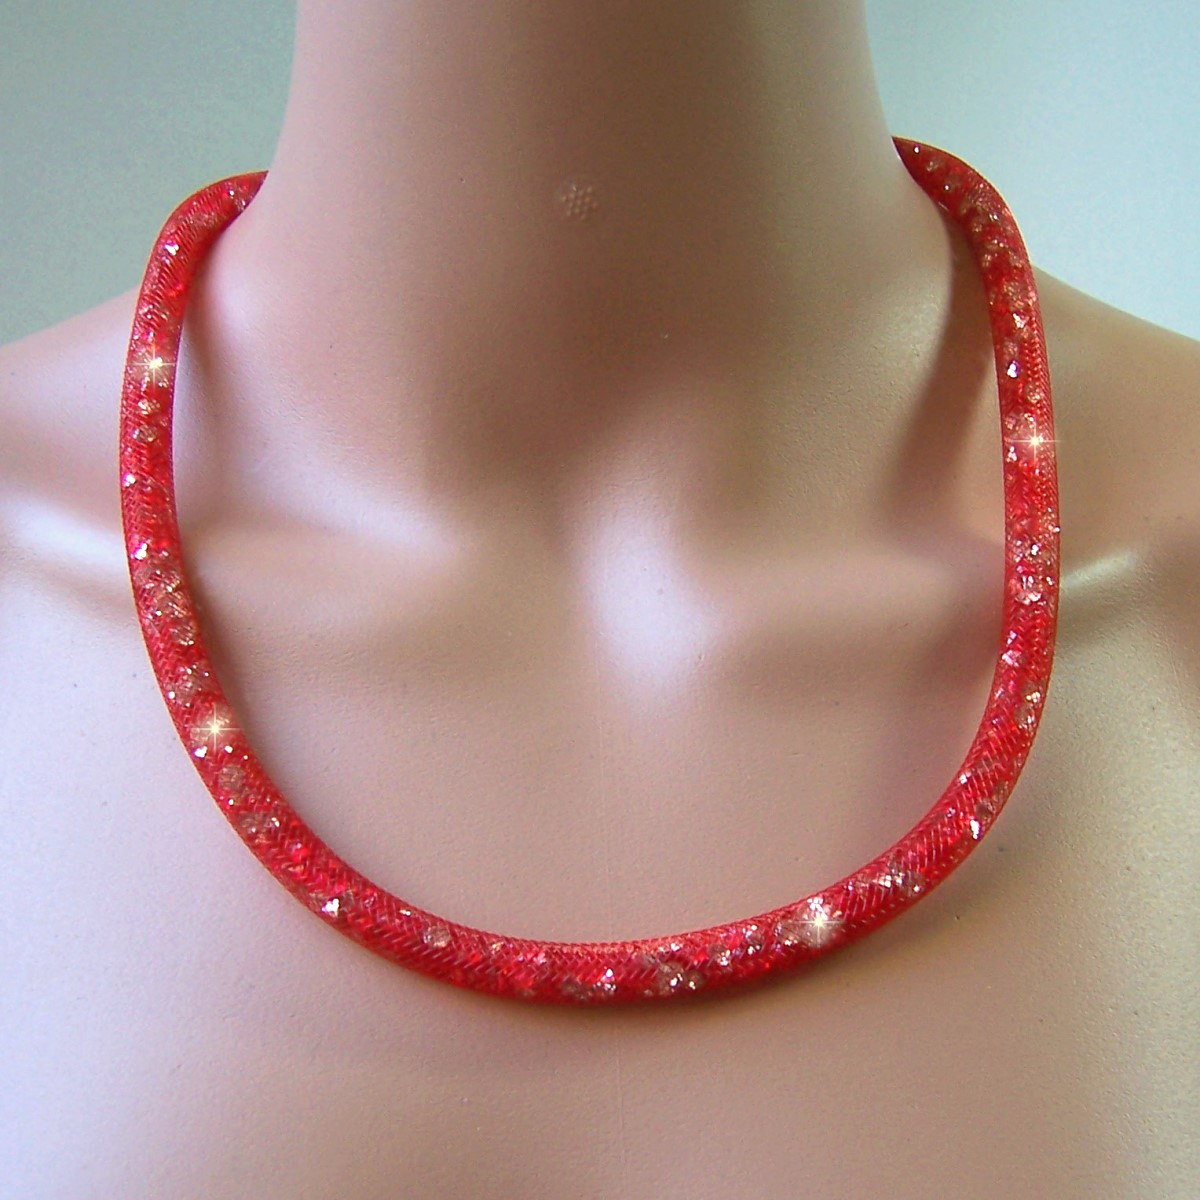 K2840# Collier 58cm lang Strasskristalle rot in 3D-Netzschlauch